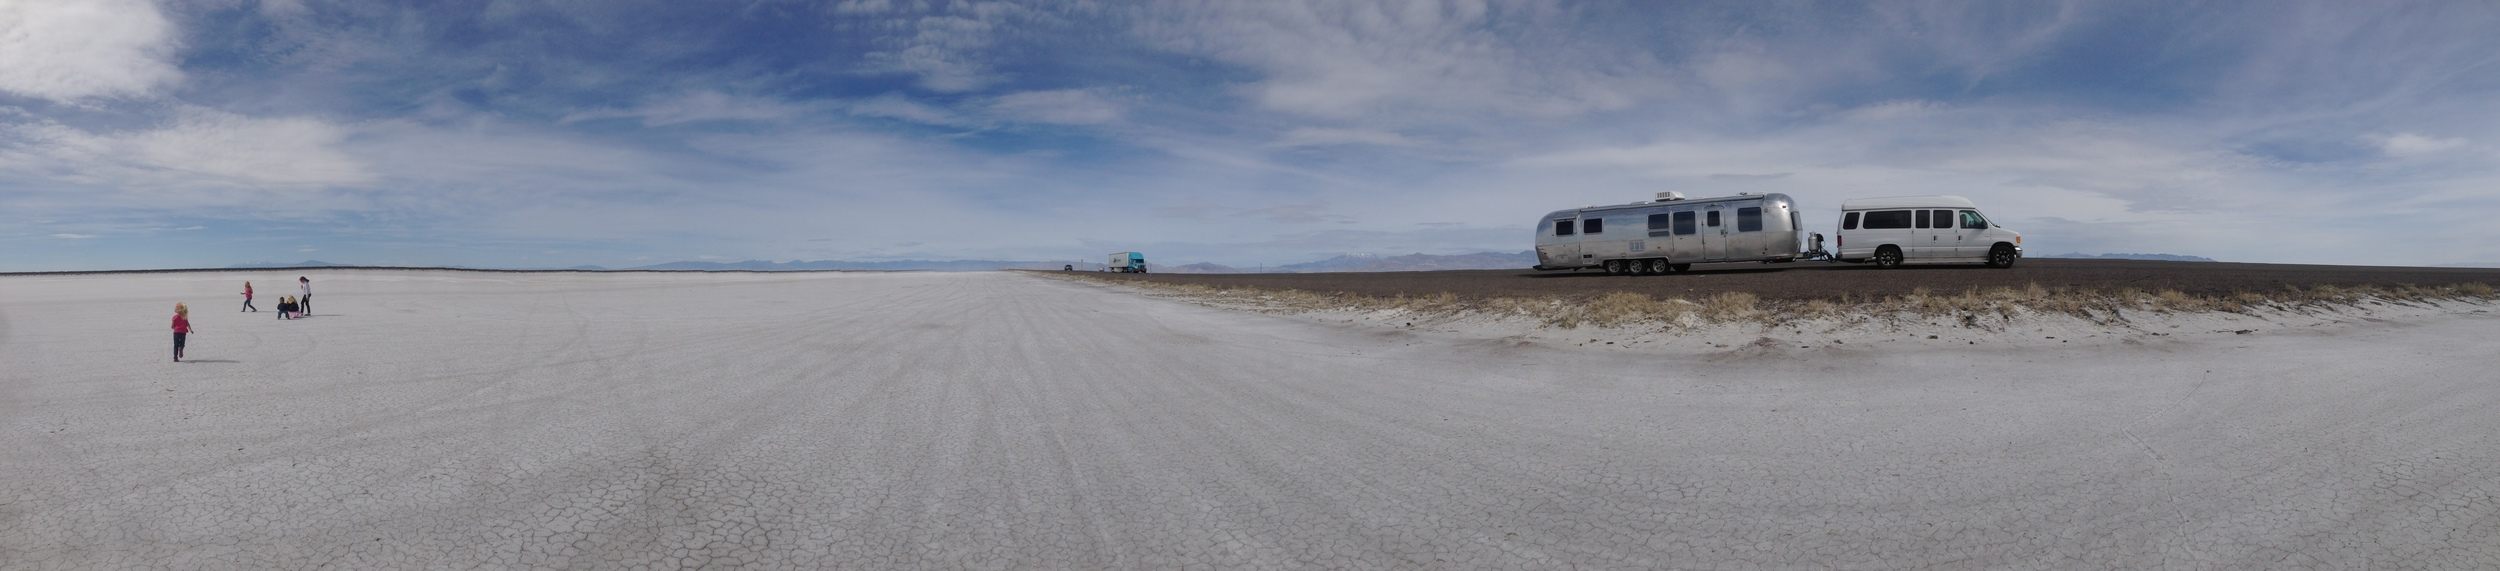 Bonneville Salt Flats in Utah.